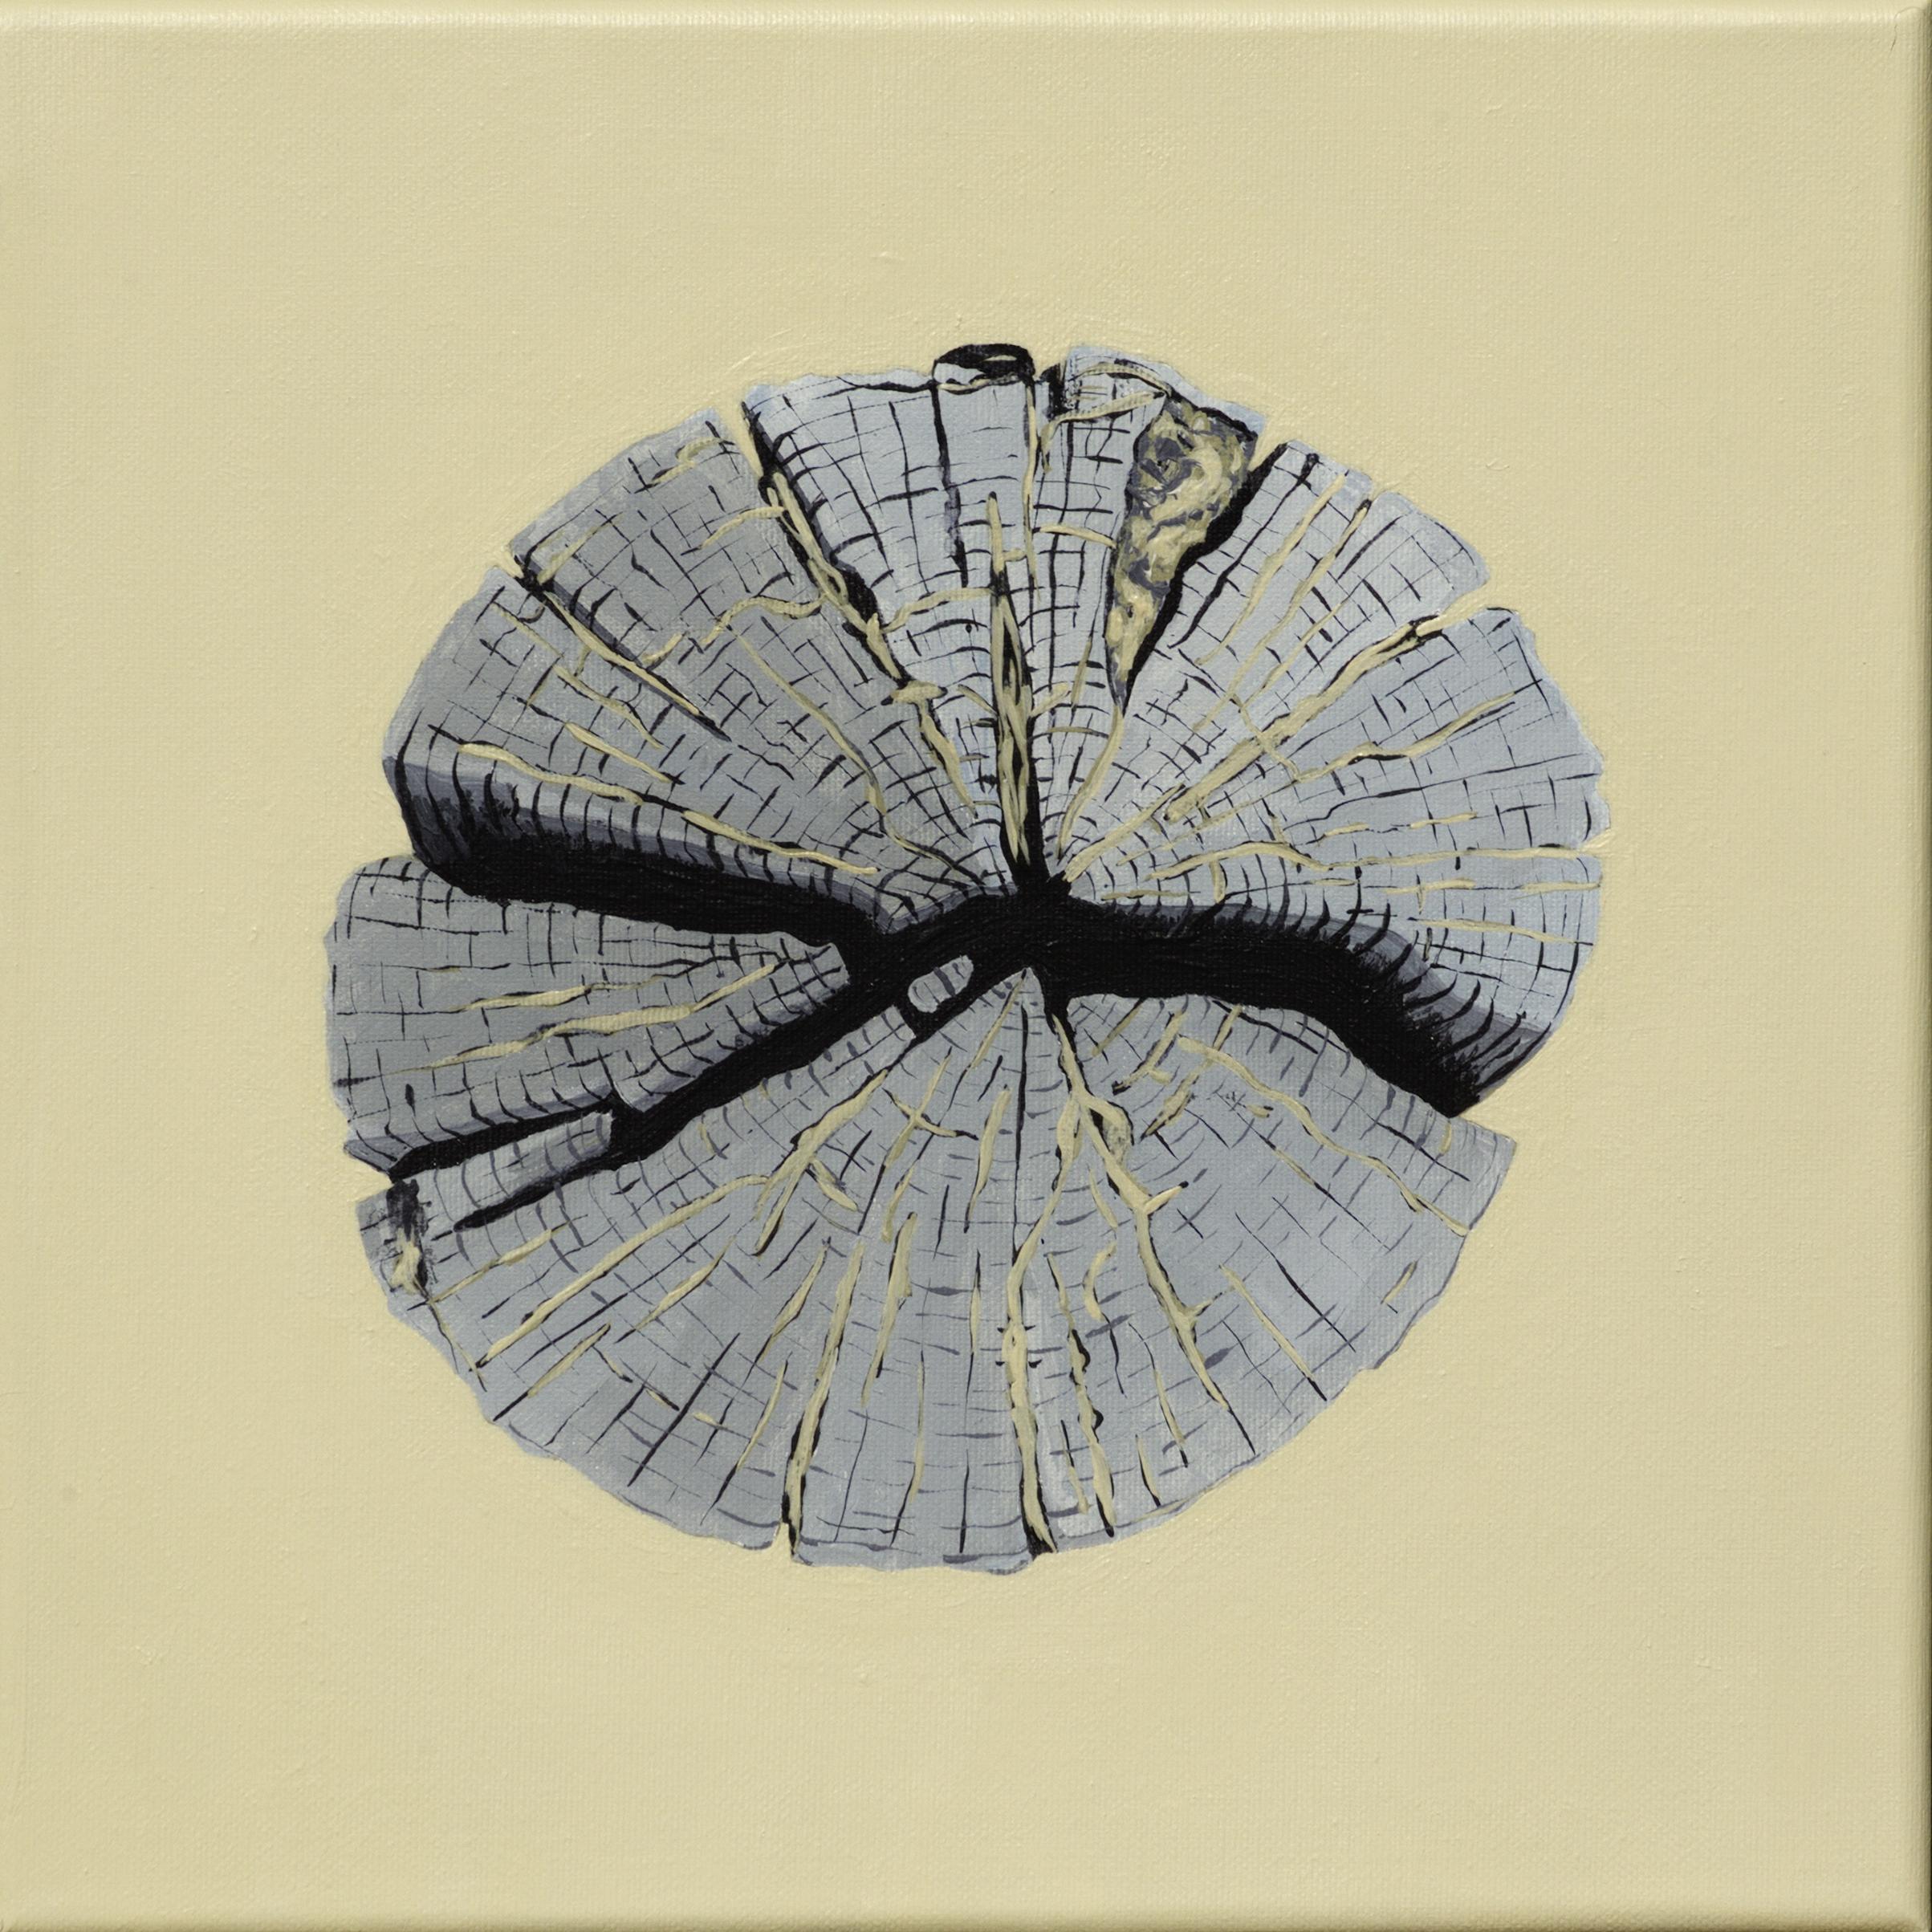 Paalkop 12 - acryl op canvas - 30 x 30 cm